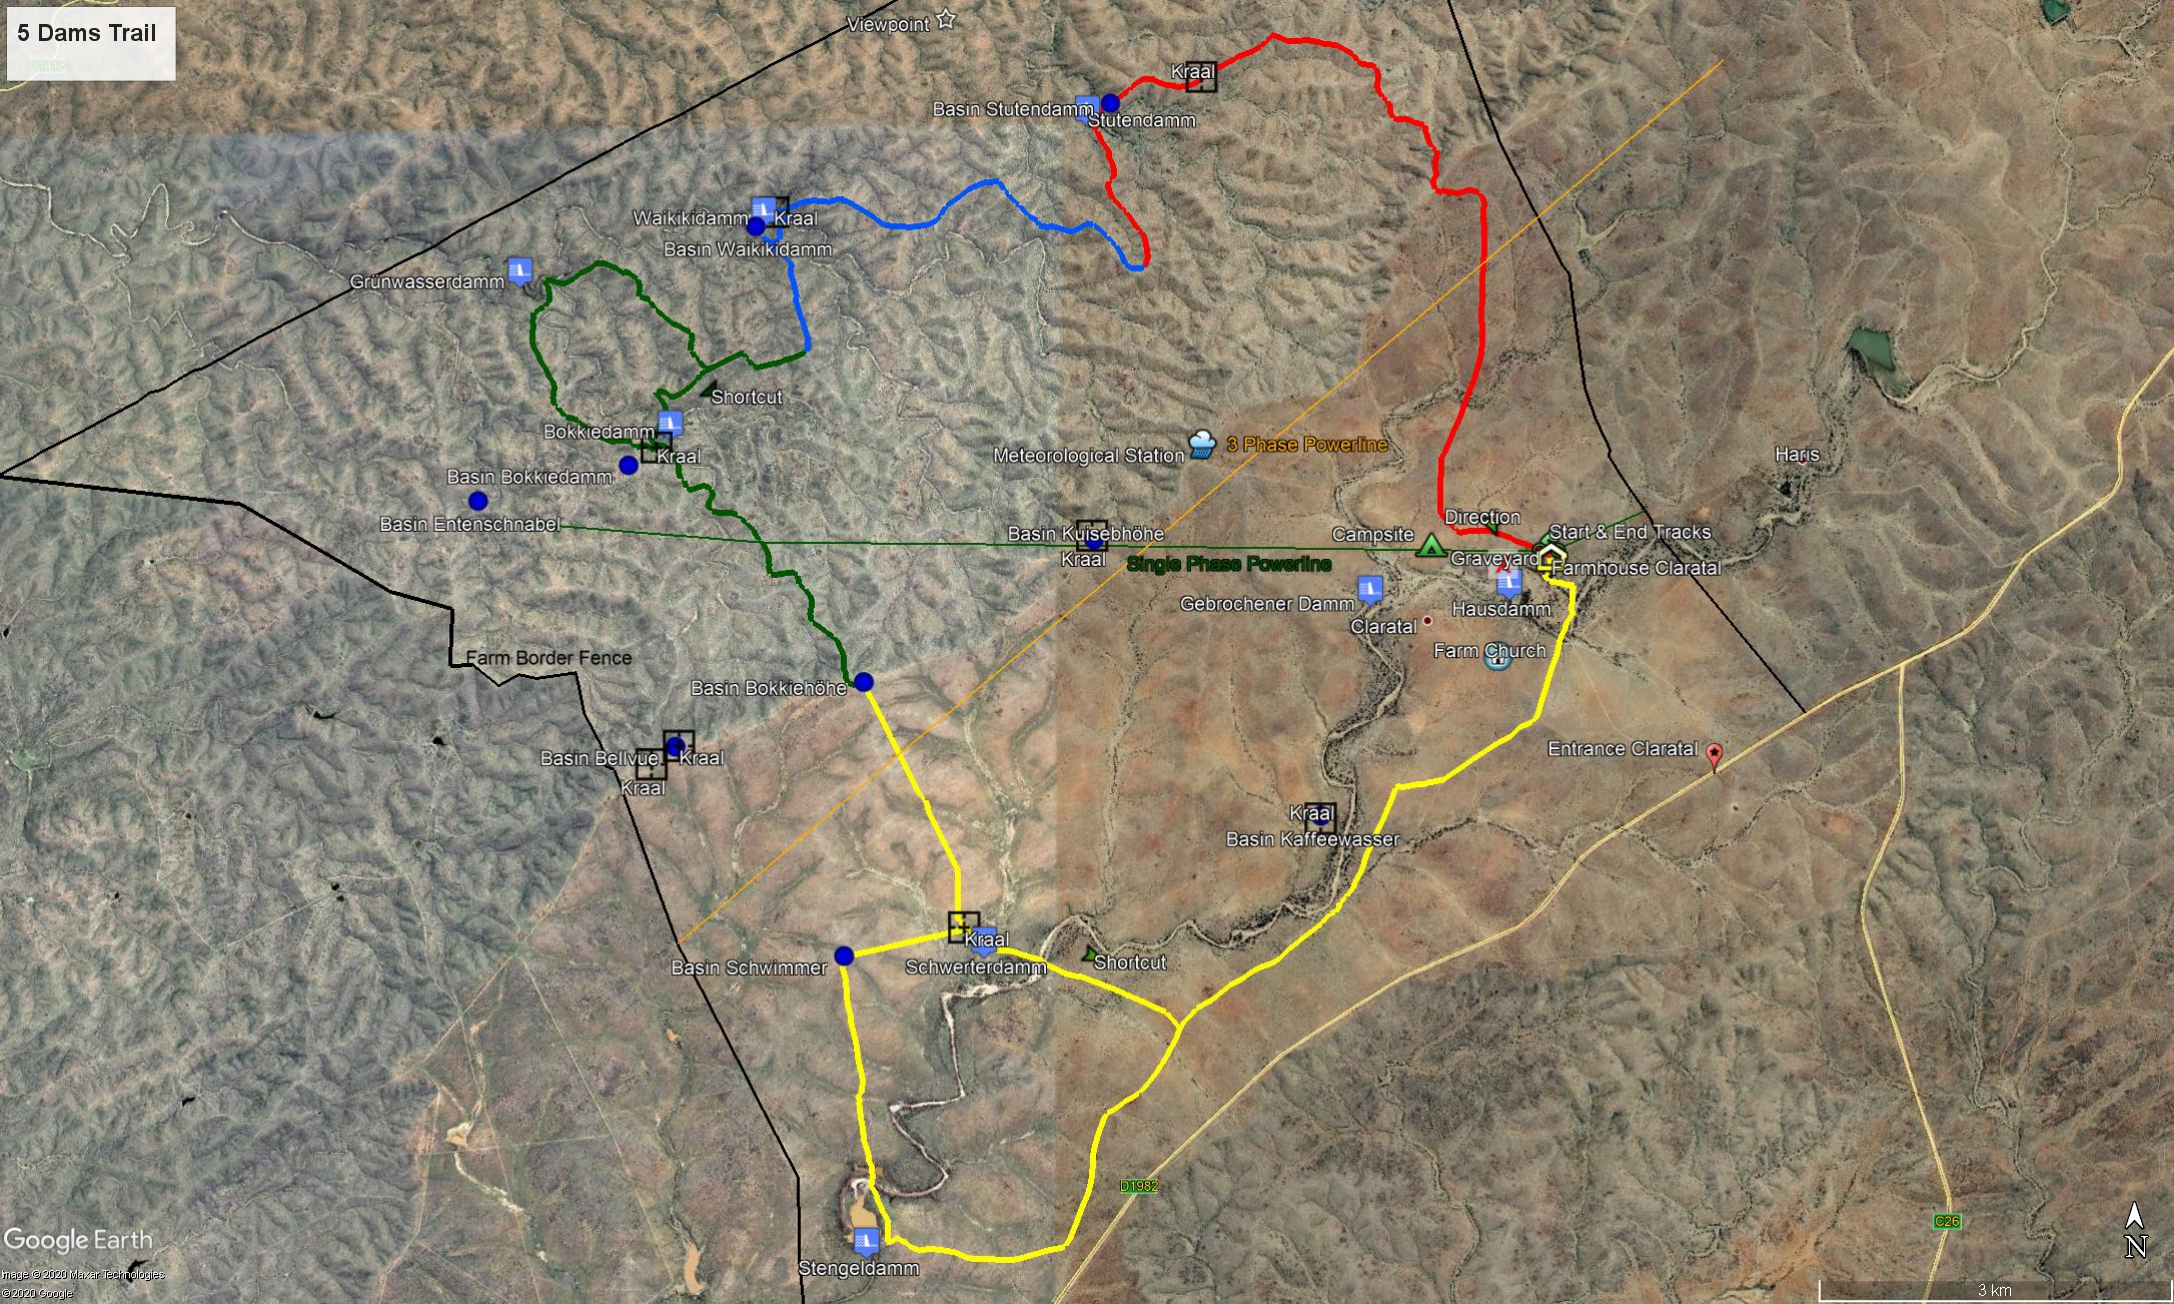 Map 5 Dams Trail